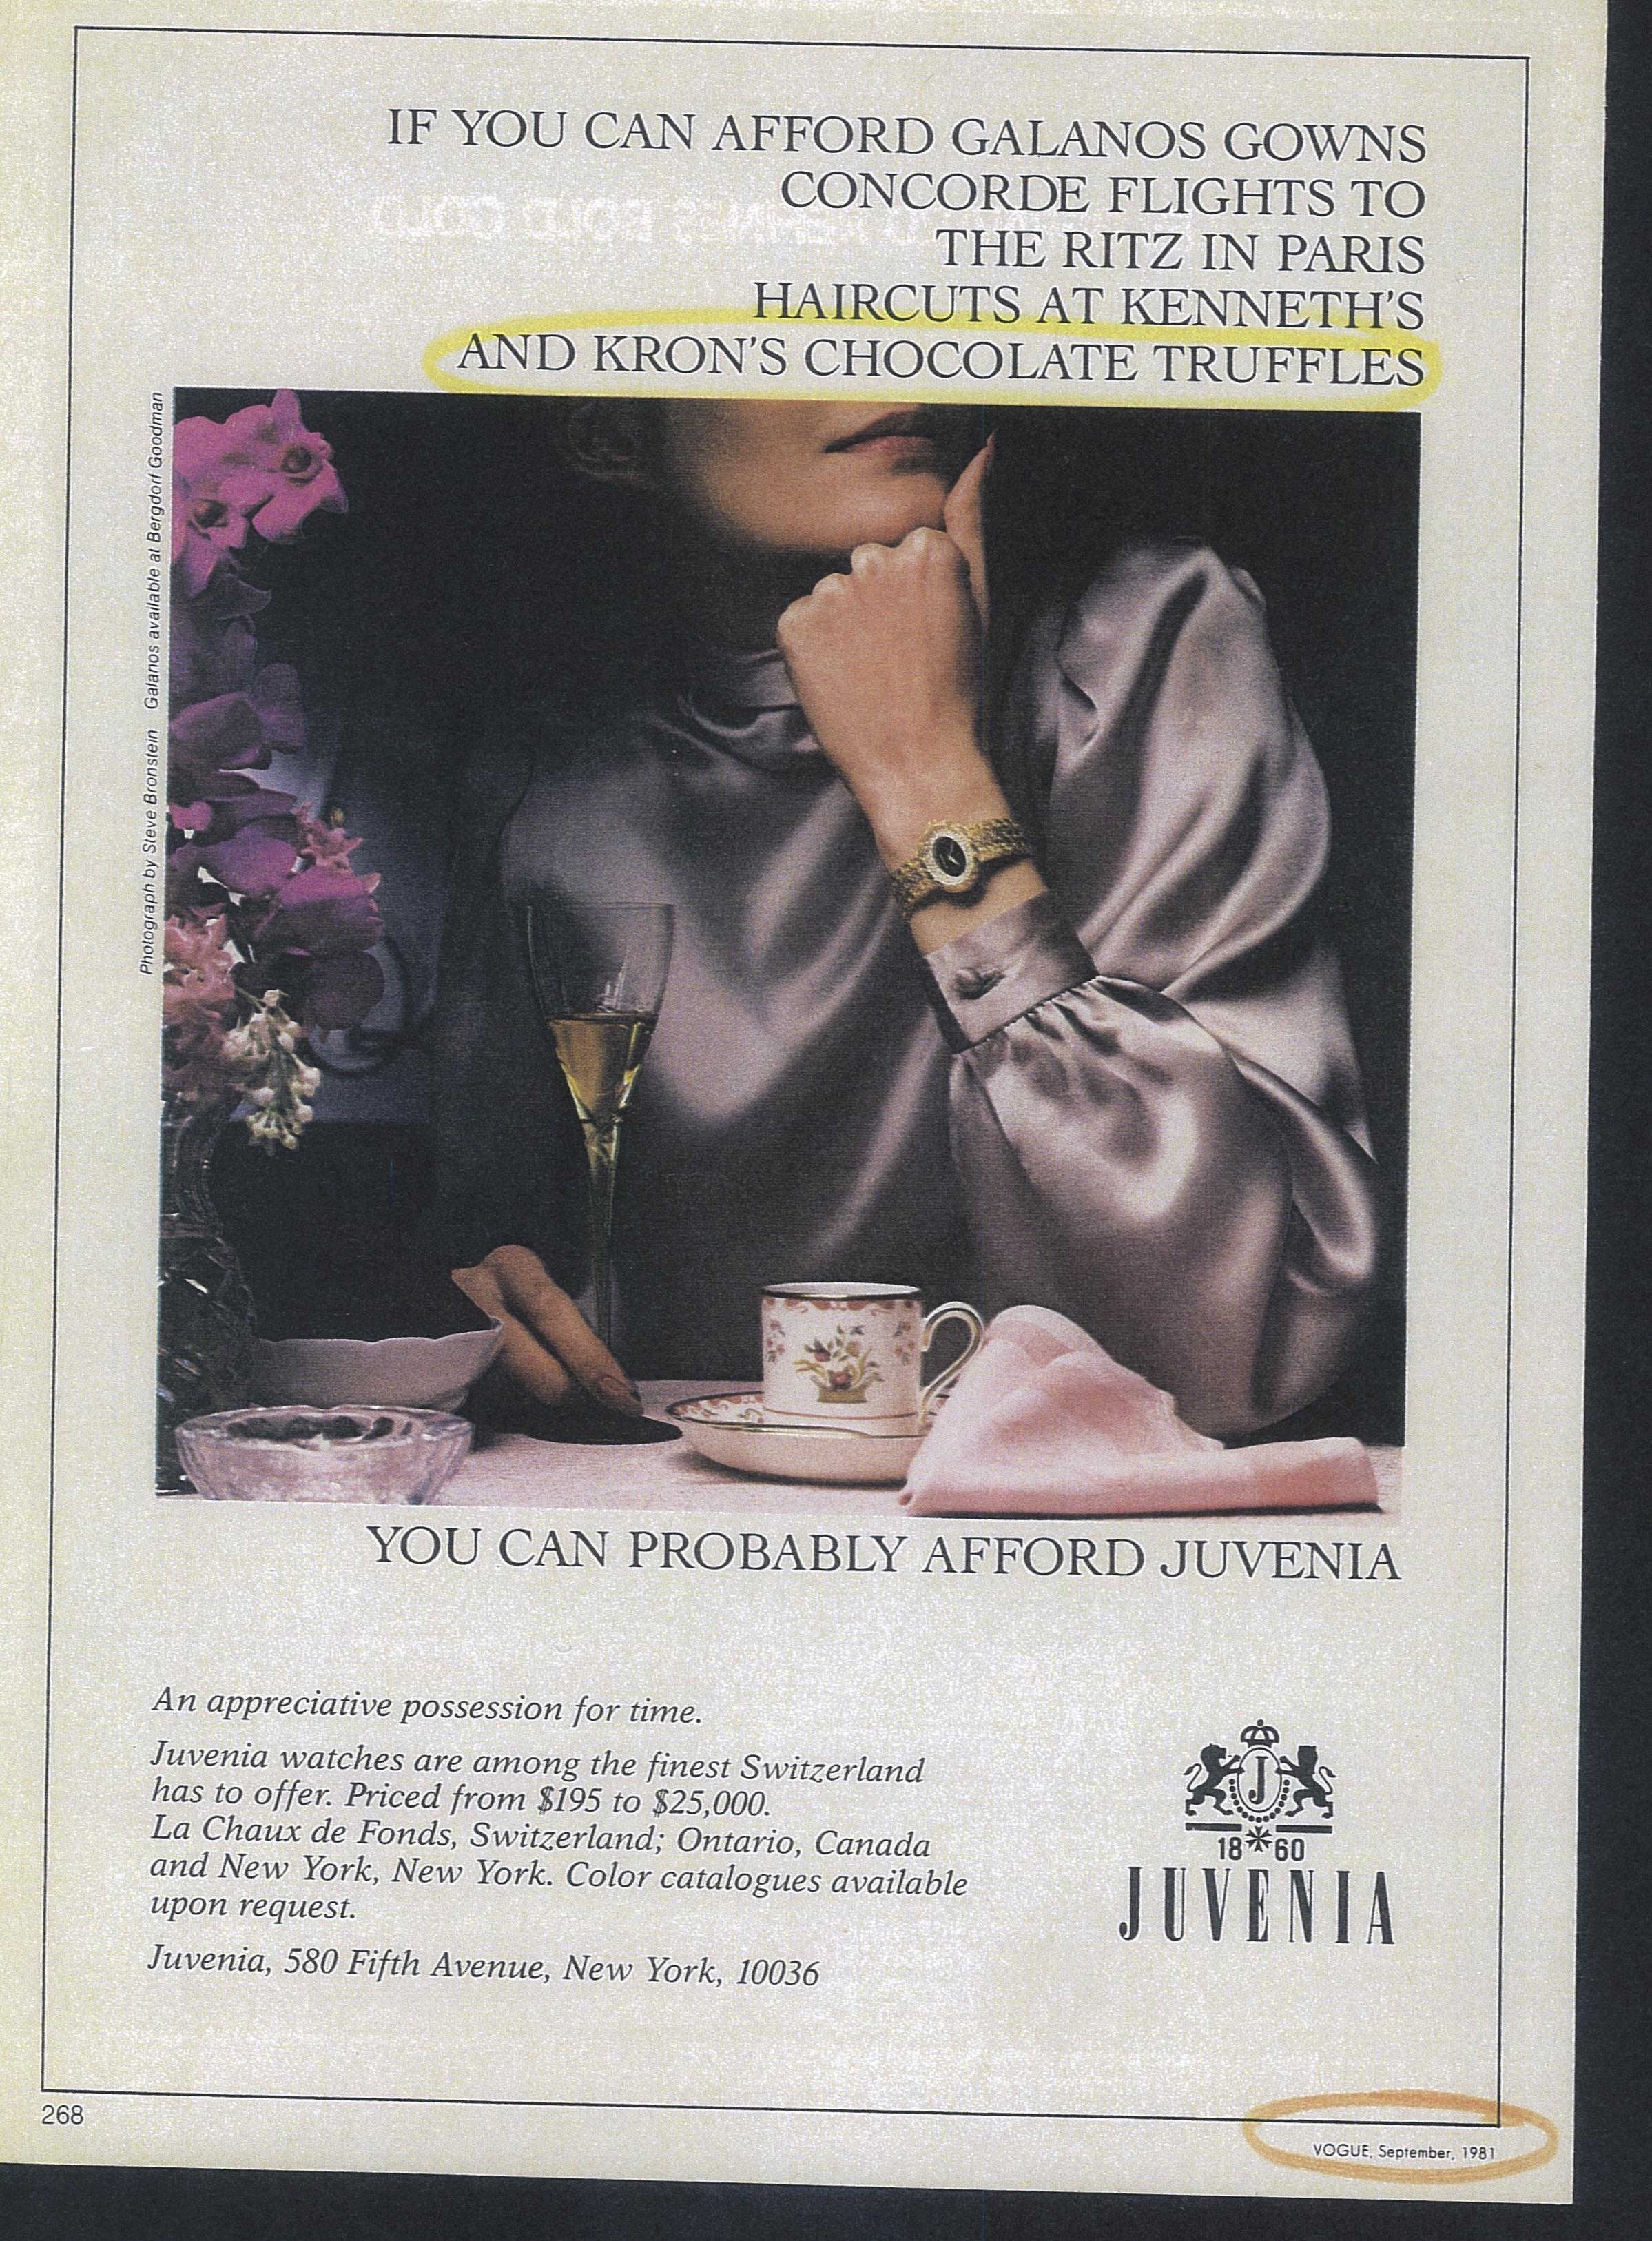 Juvenia (1981)